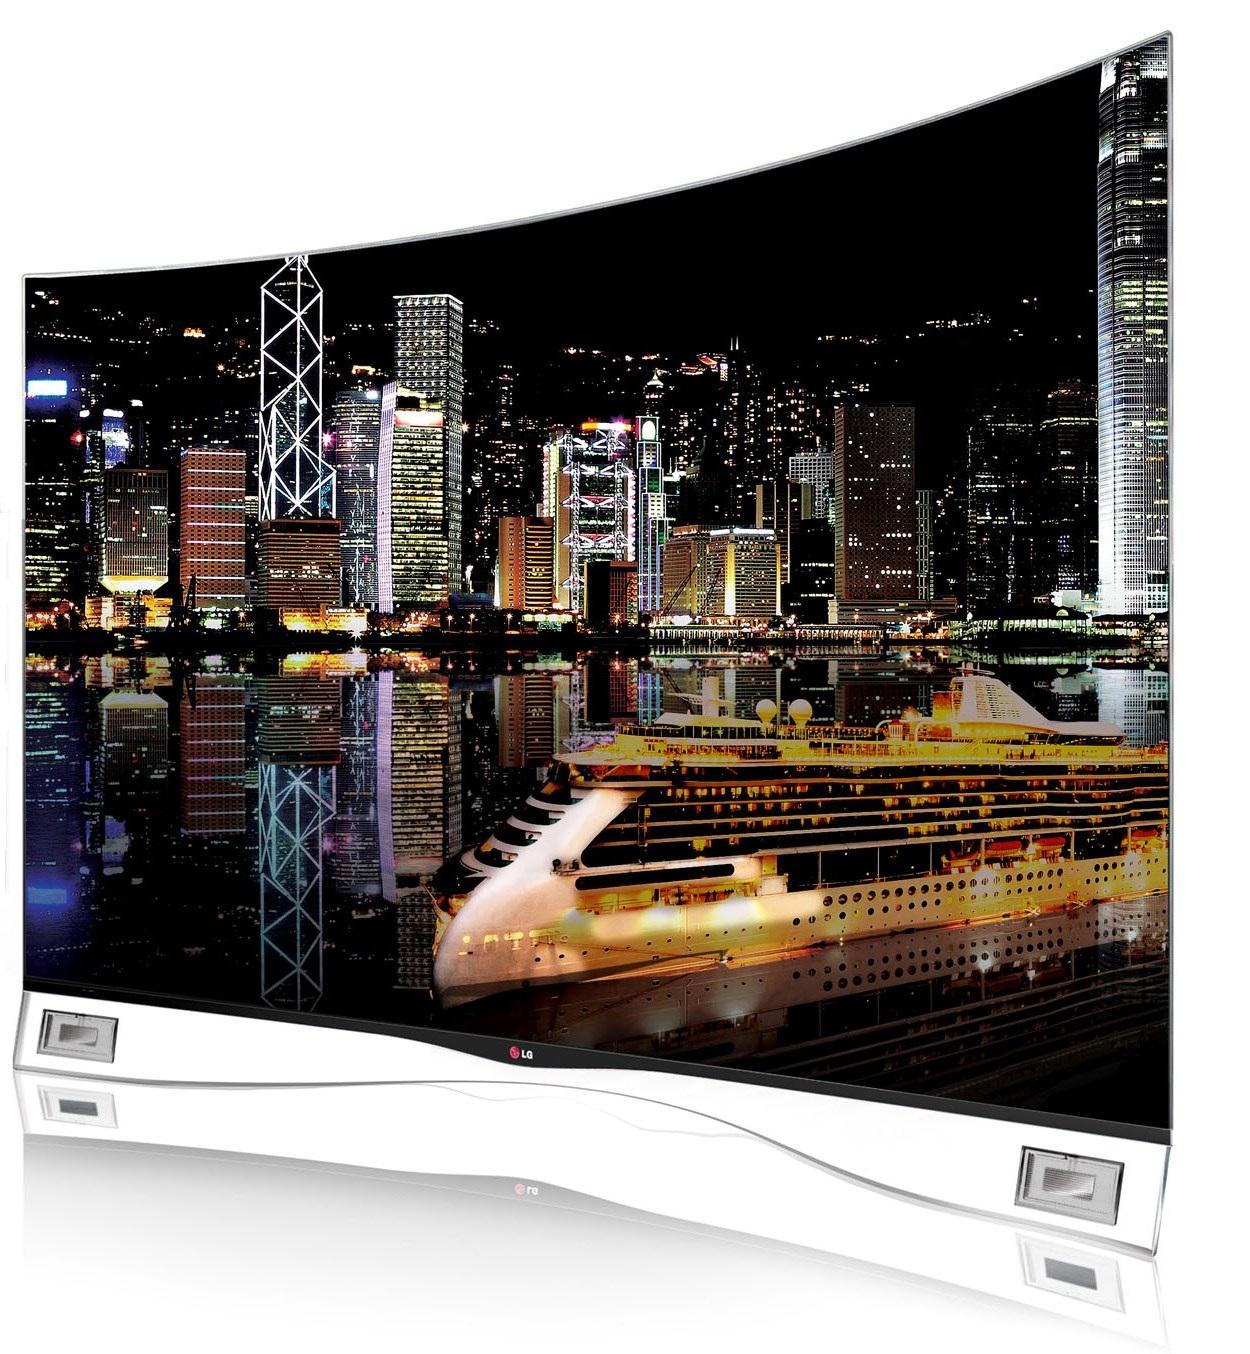 Кронштейн для телевизора жк led и плазменных панелей